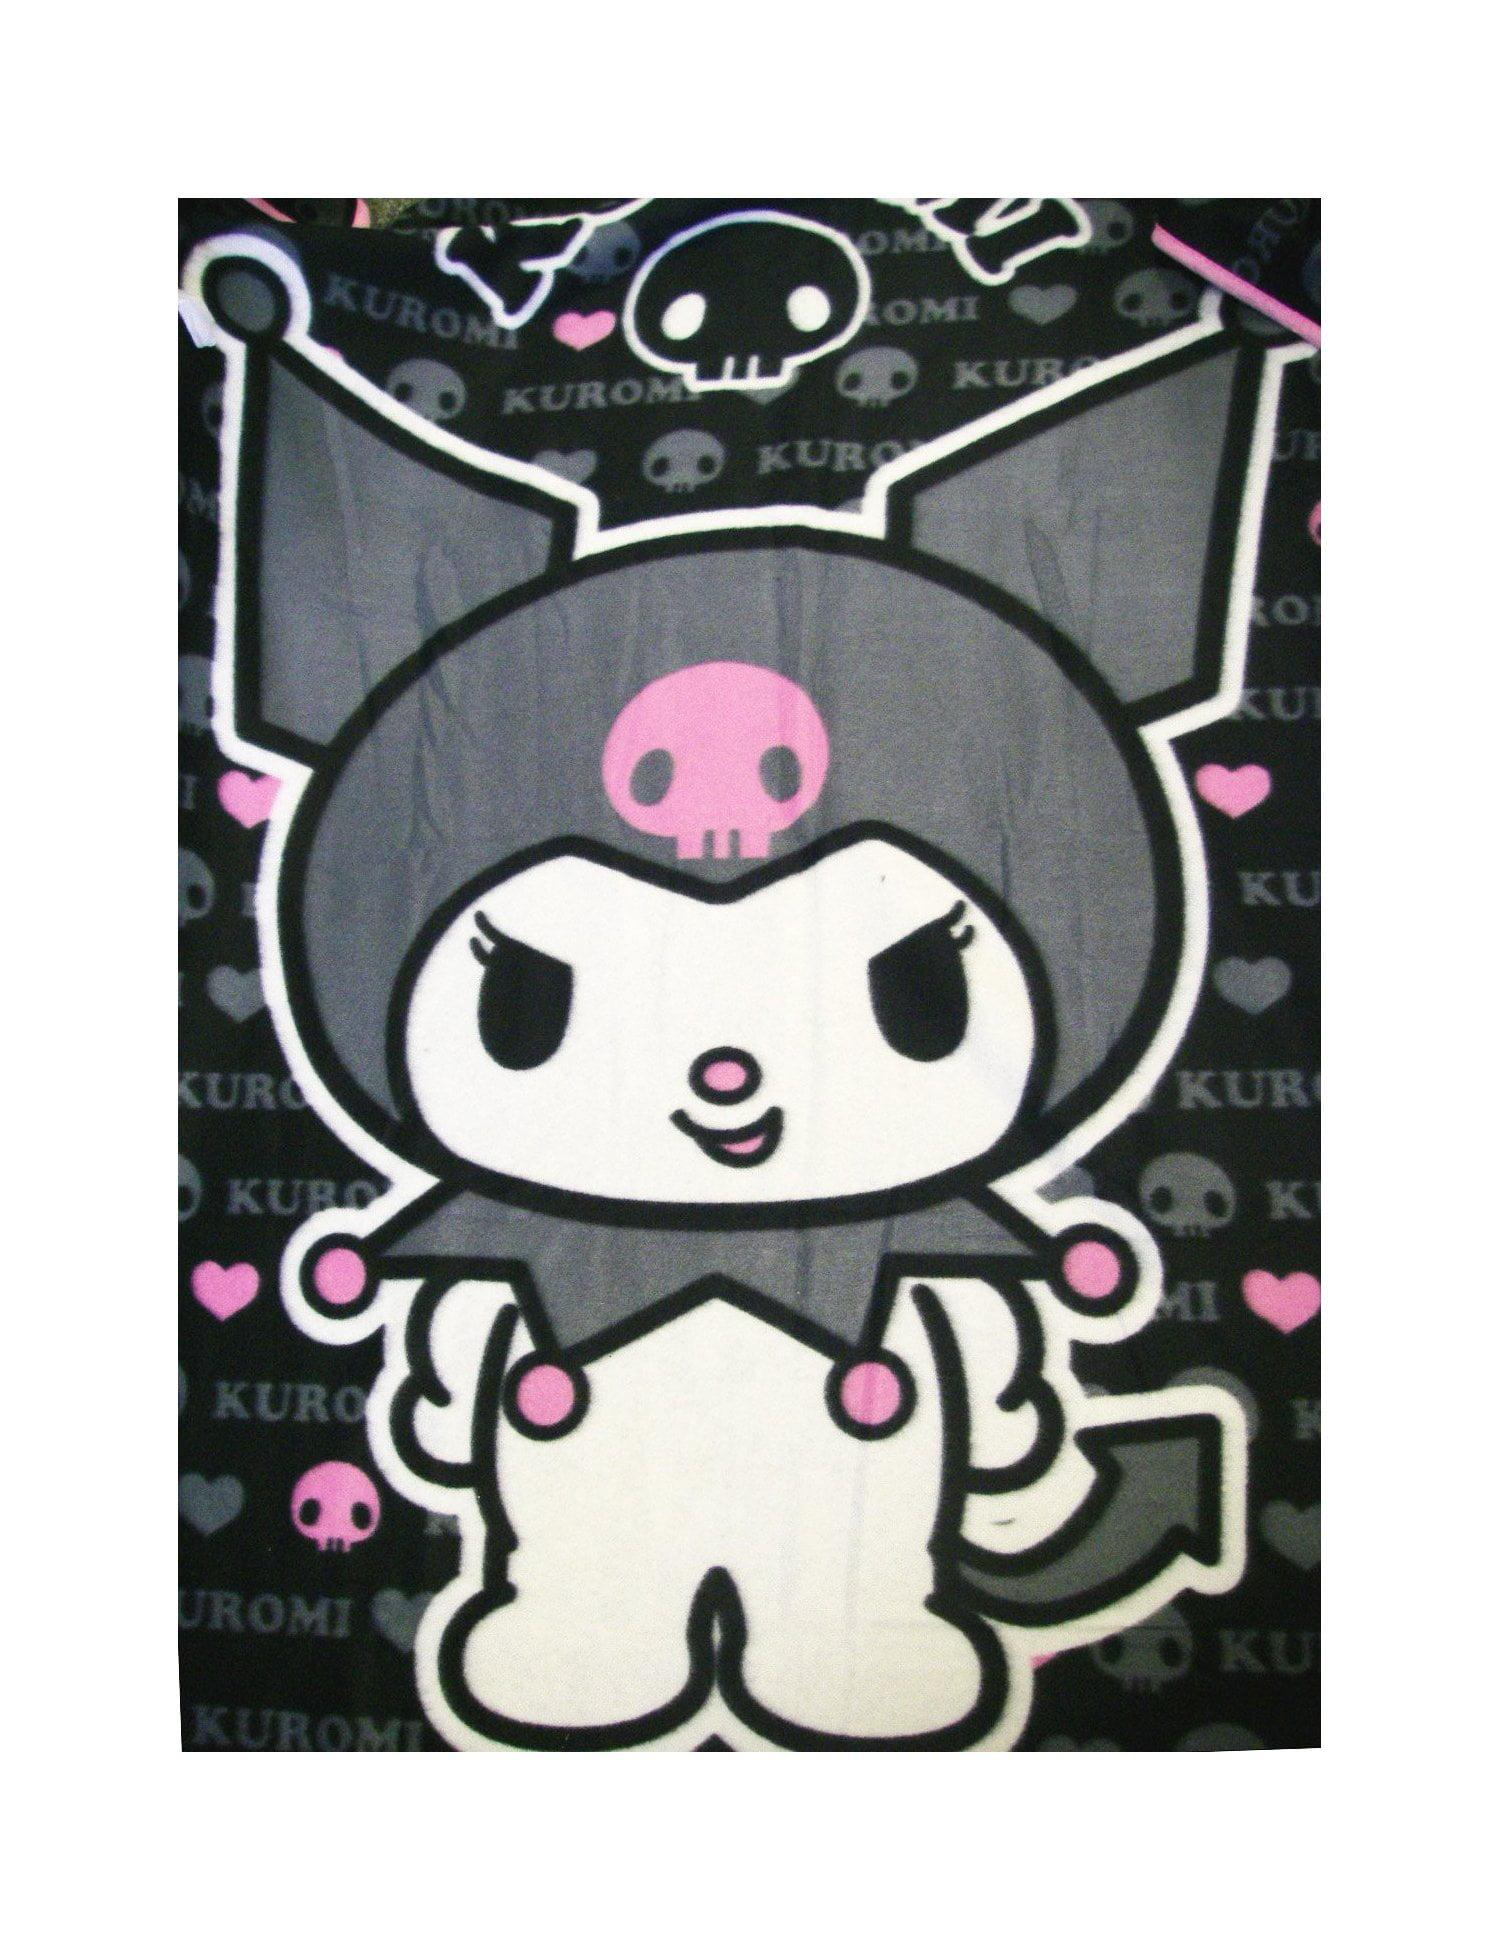 Blanket Sanrio Kuromi Devil Goth Skull Fleece Throw New Gifts Toys 65839 Walmart Com Walmart Com